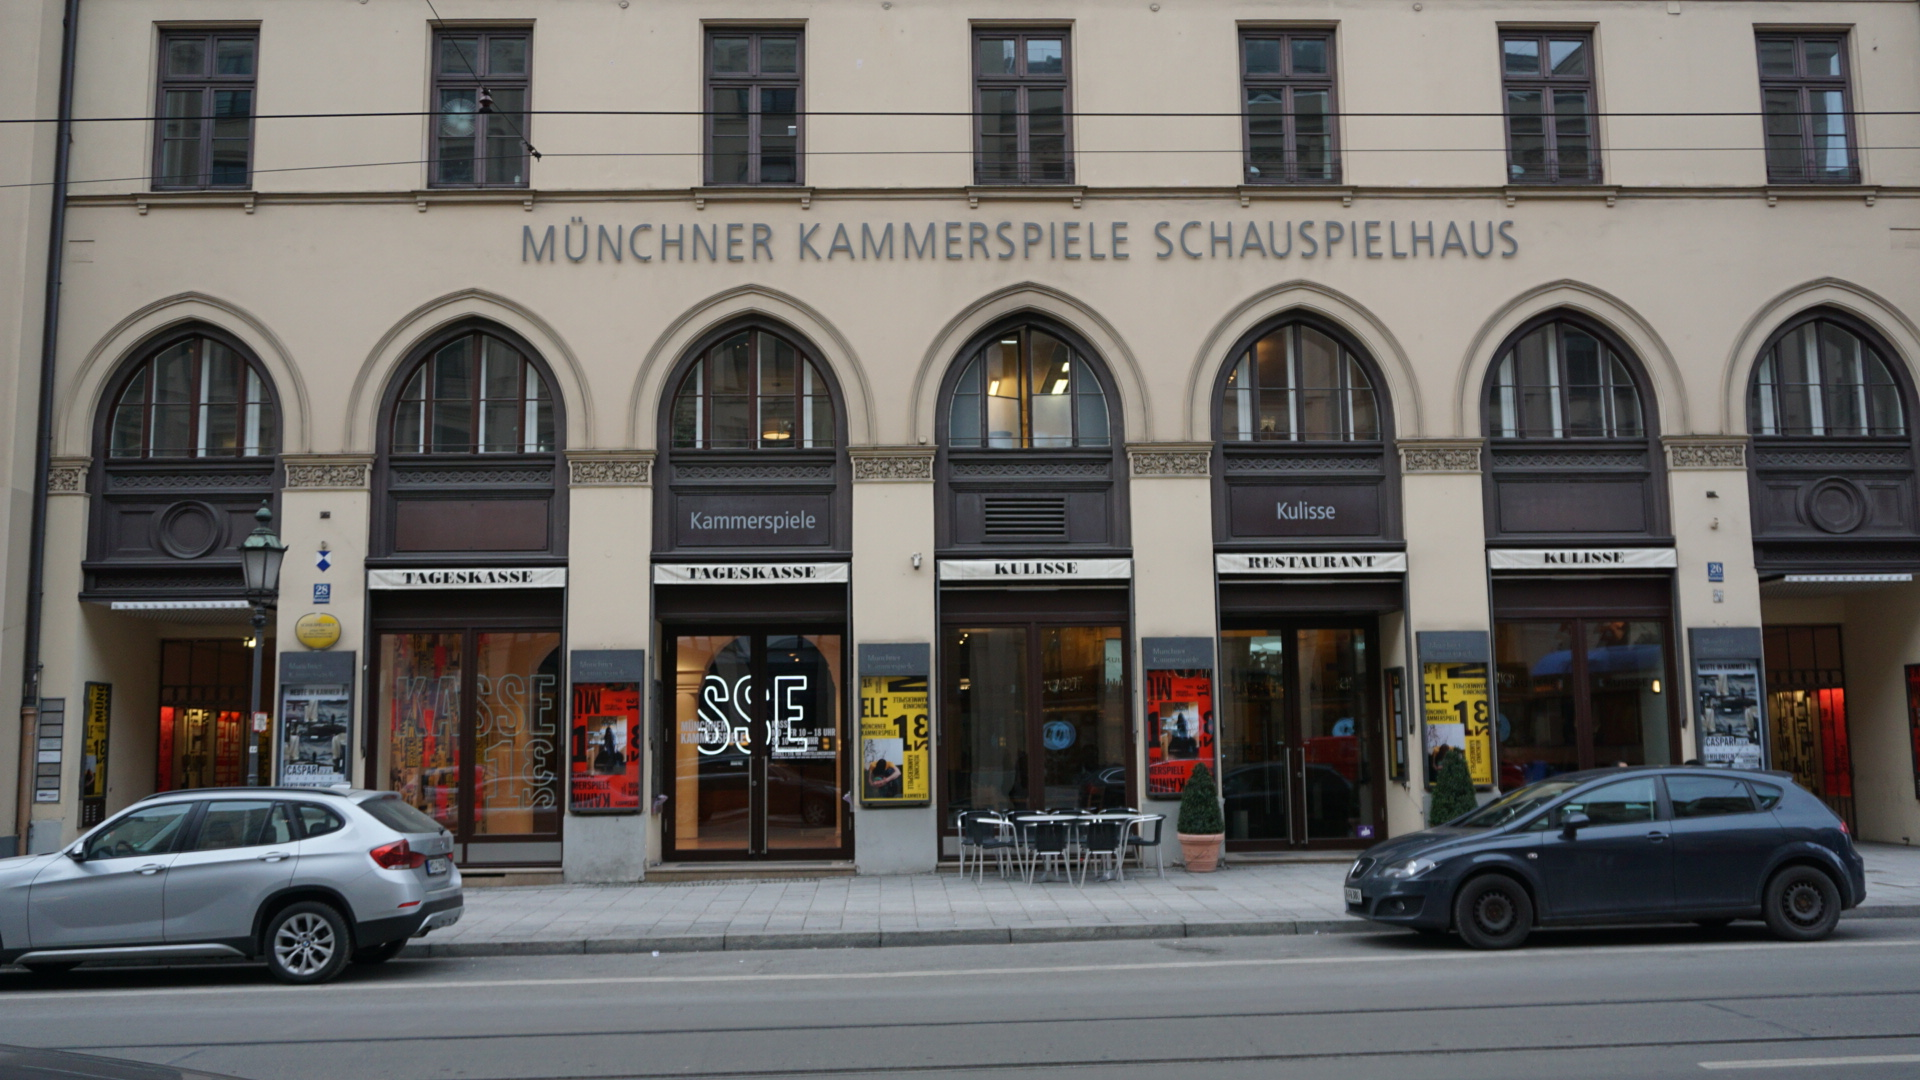 Münchner Kammerspiel